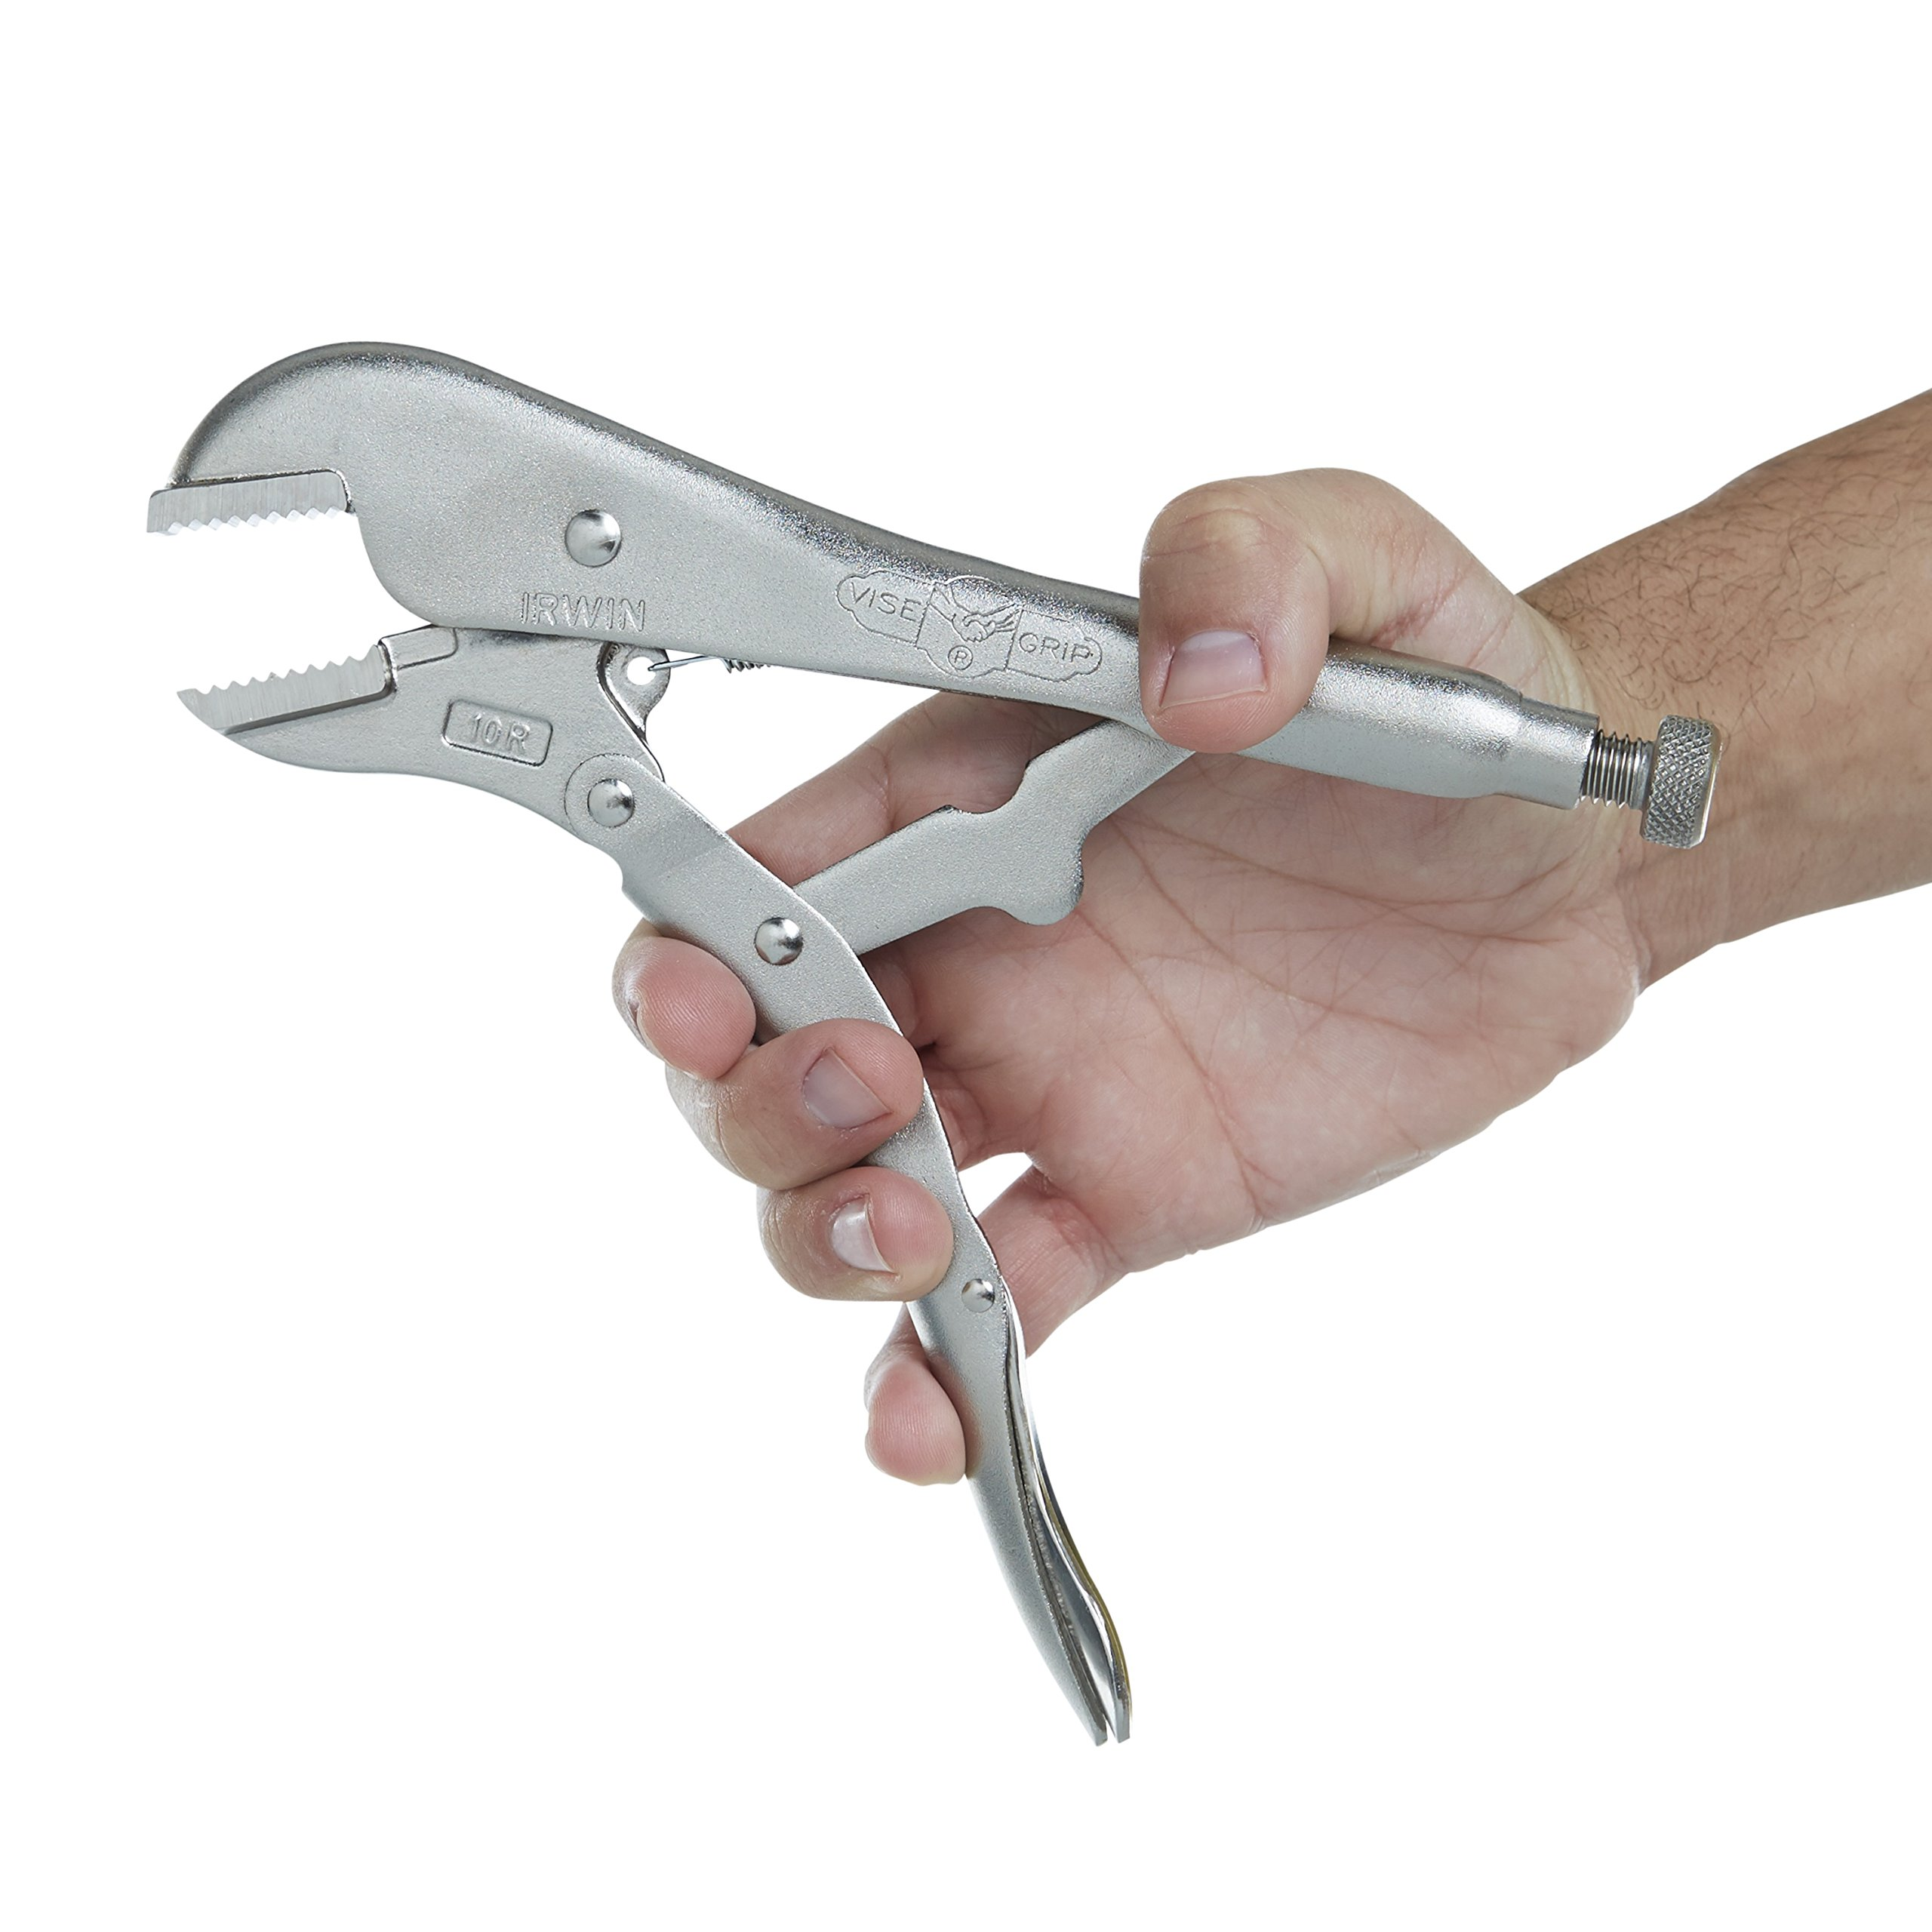 IRWIN Tools VISE-GRIP Locking Pliers, Original, Straight Jaw, 10-inch (102L3) by Irwin Tools (Image #4)